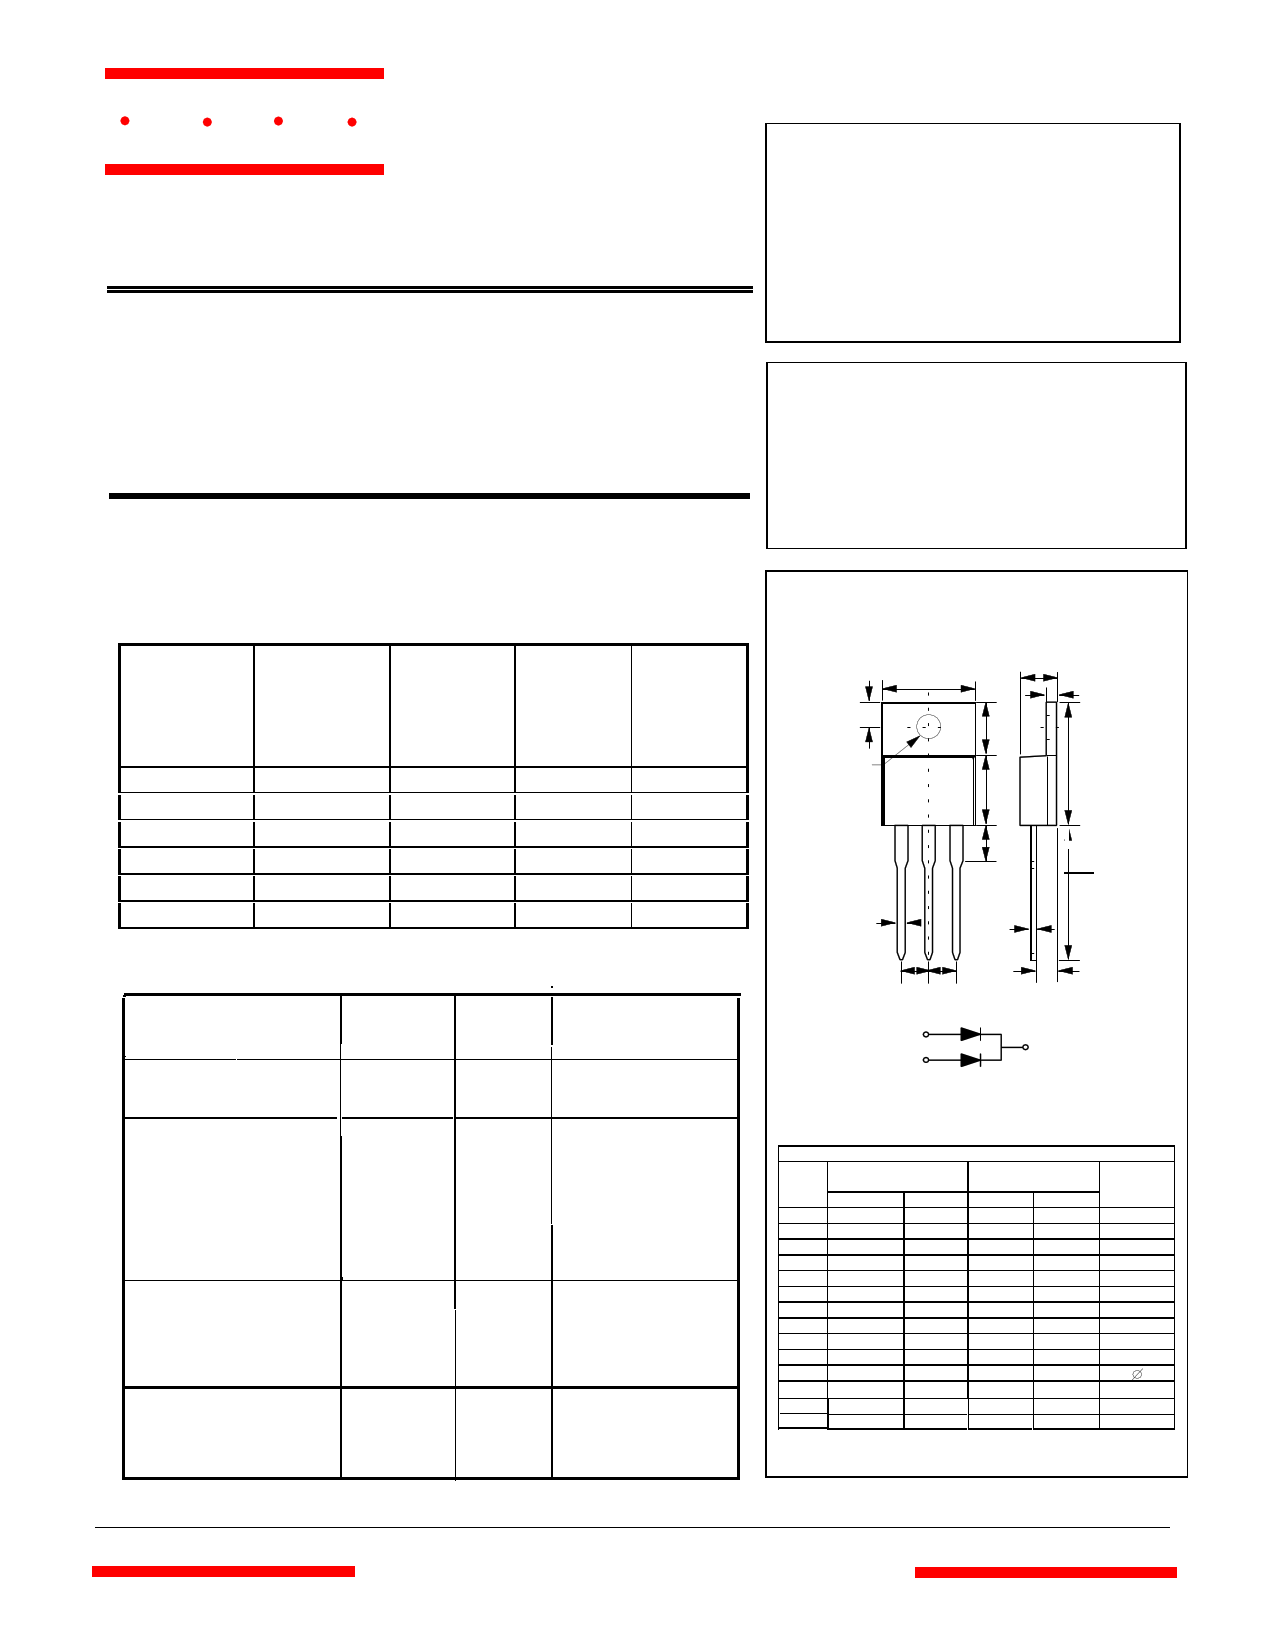 MBR1045CT datasheet